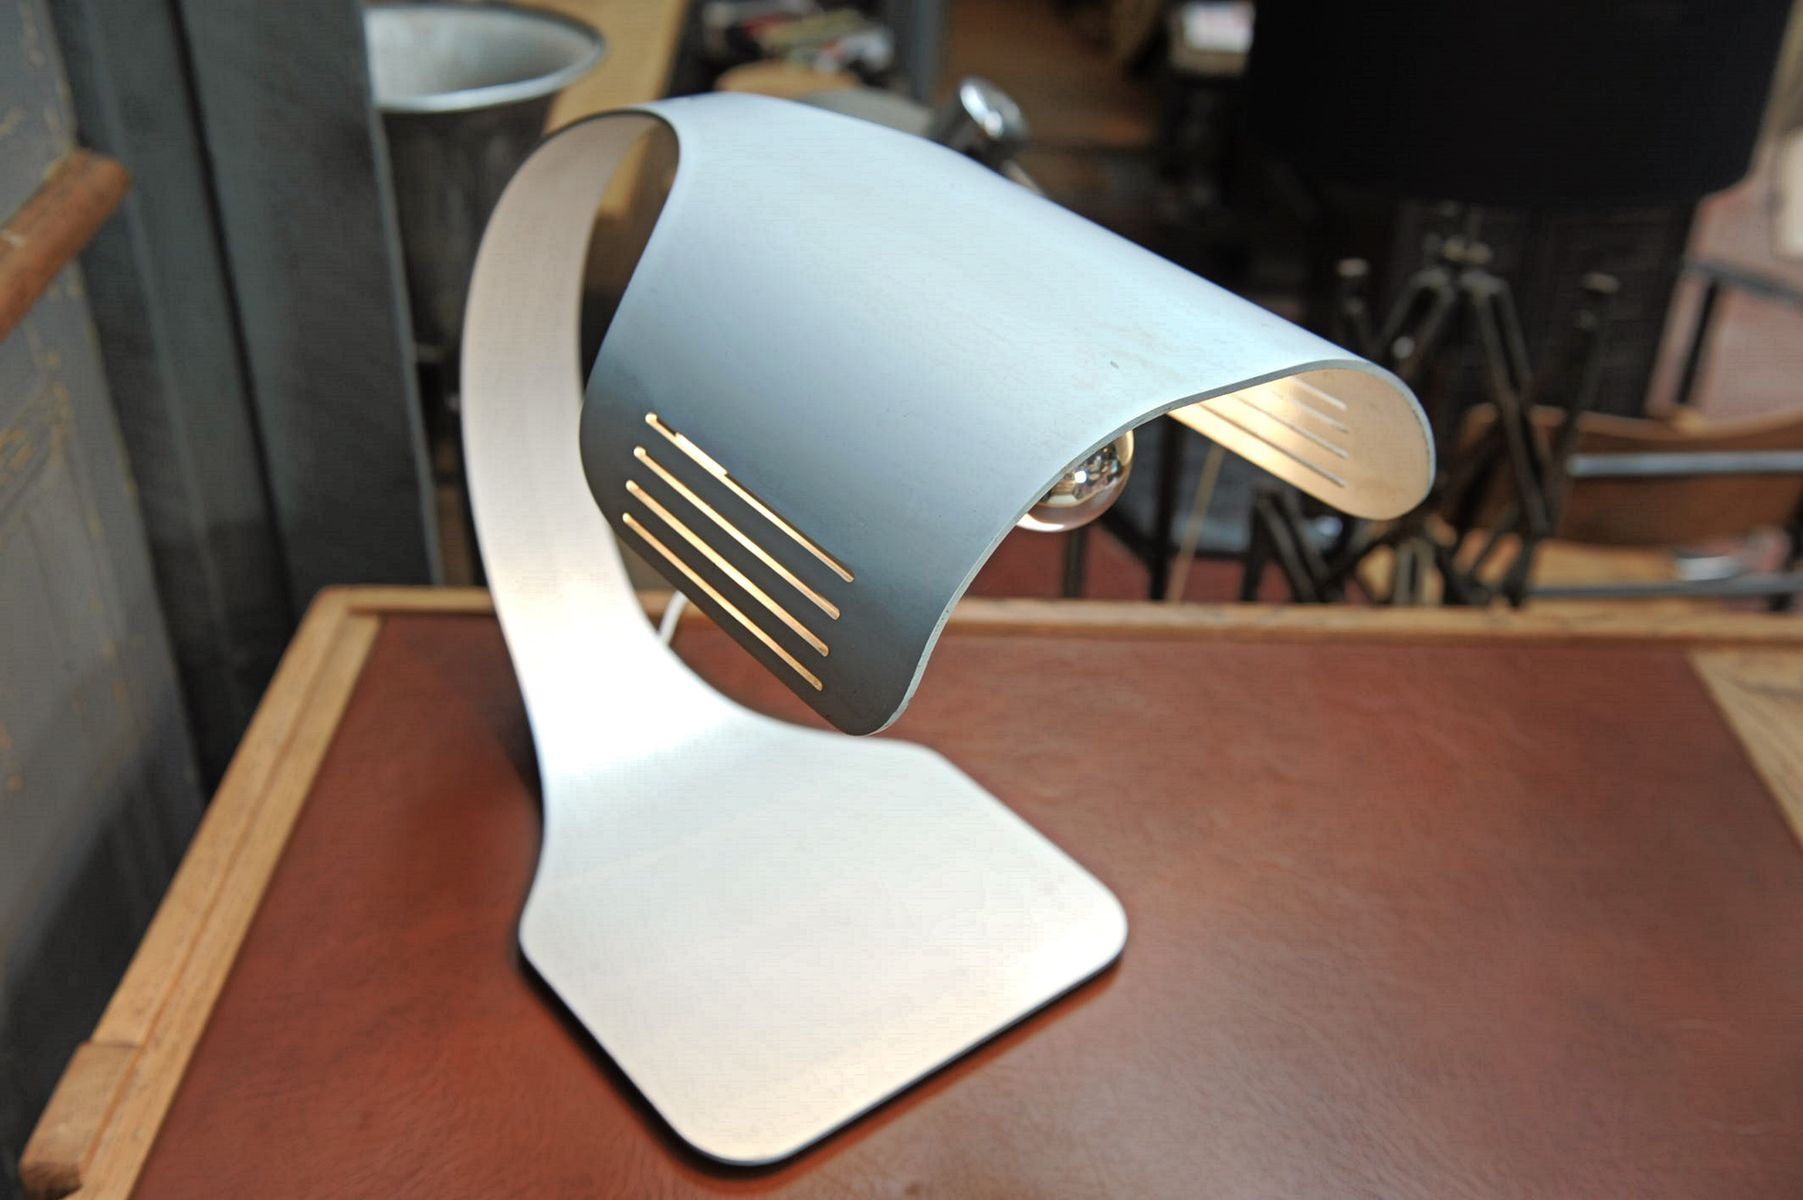 Lampe de bureau en aluminium brossé par walter moretti s en